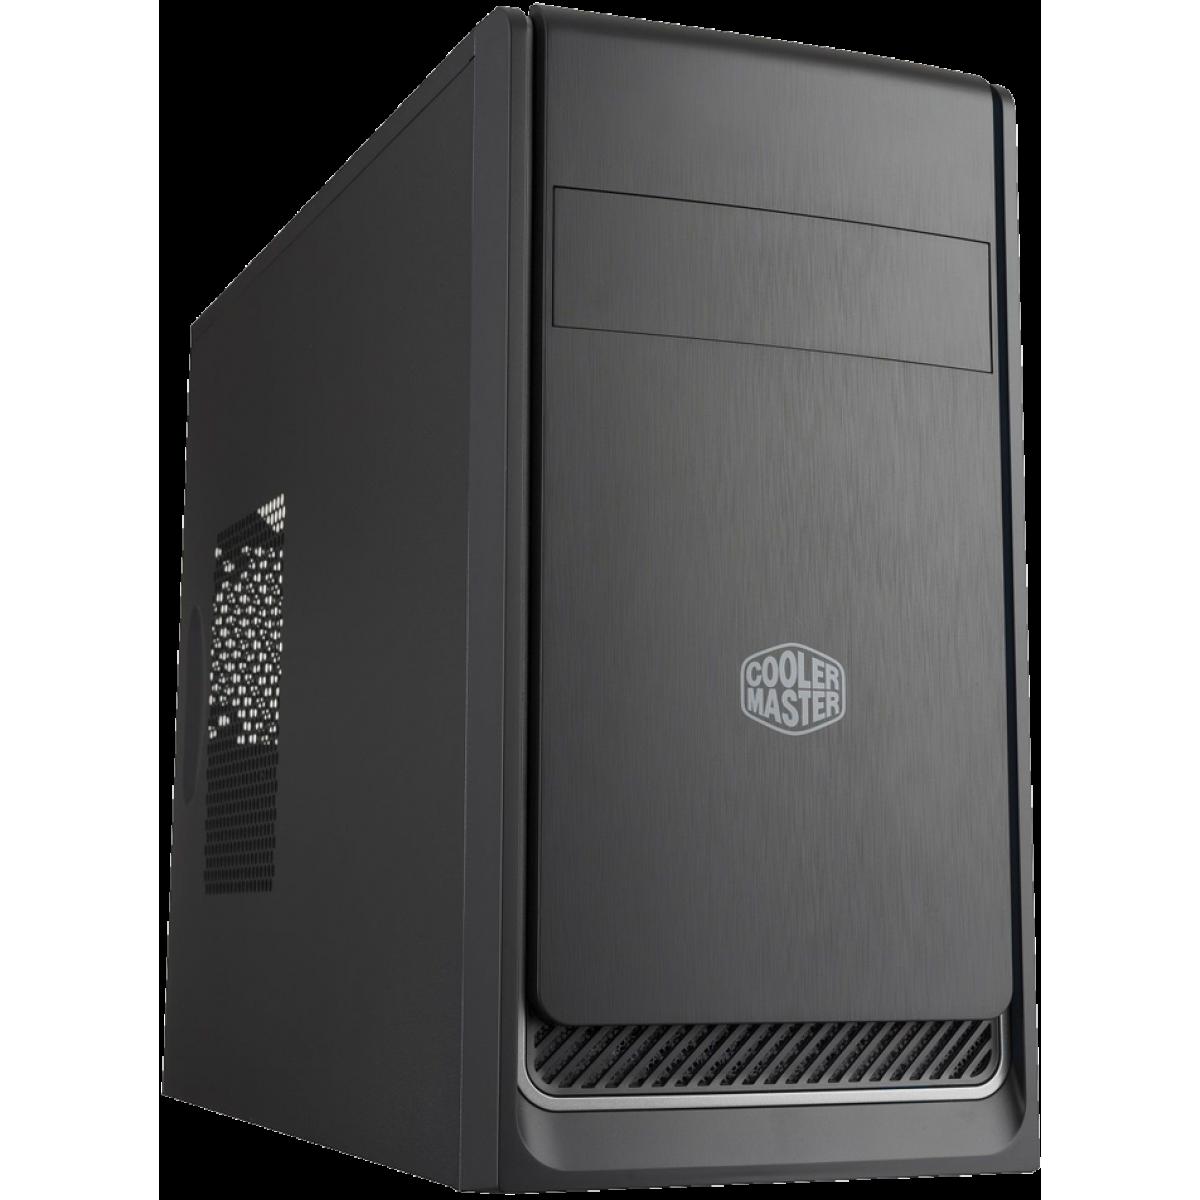 Gabinete Gamer Cooler Master Masterbox E300L, Mini Tower, Com 1 Fan, Black, Sem Fonte, MCB-E300L-KN5N-B02-Silver